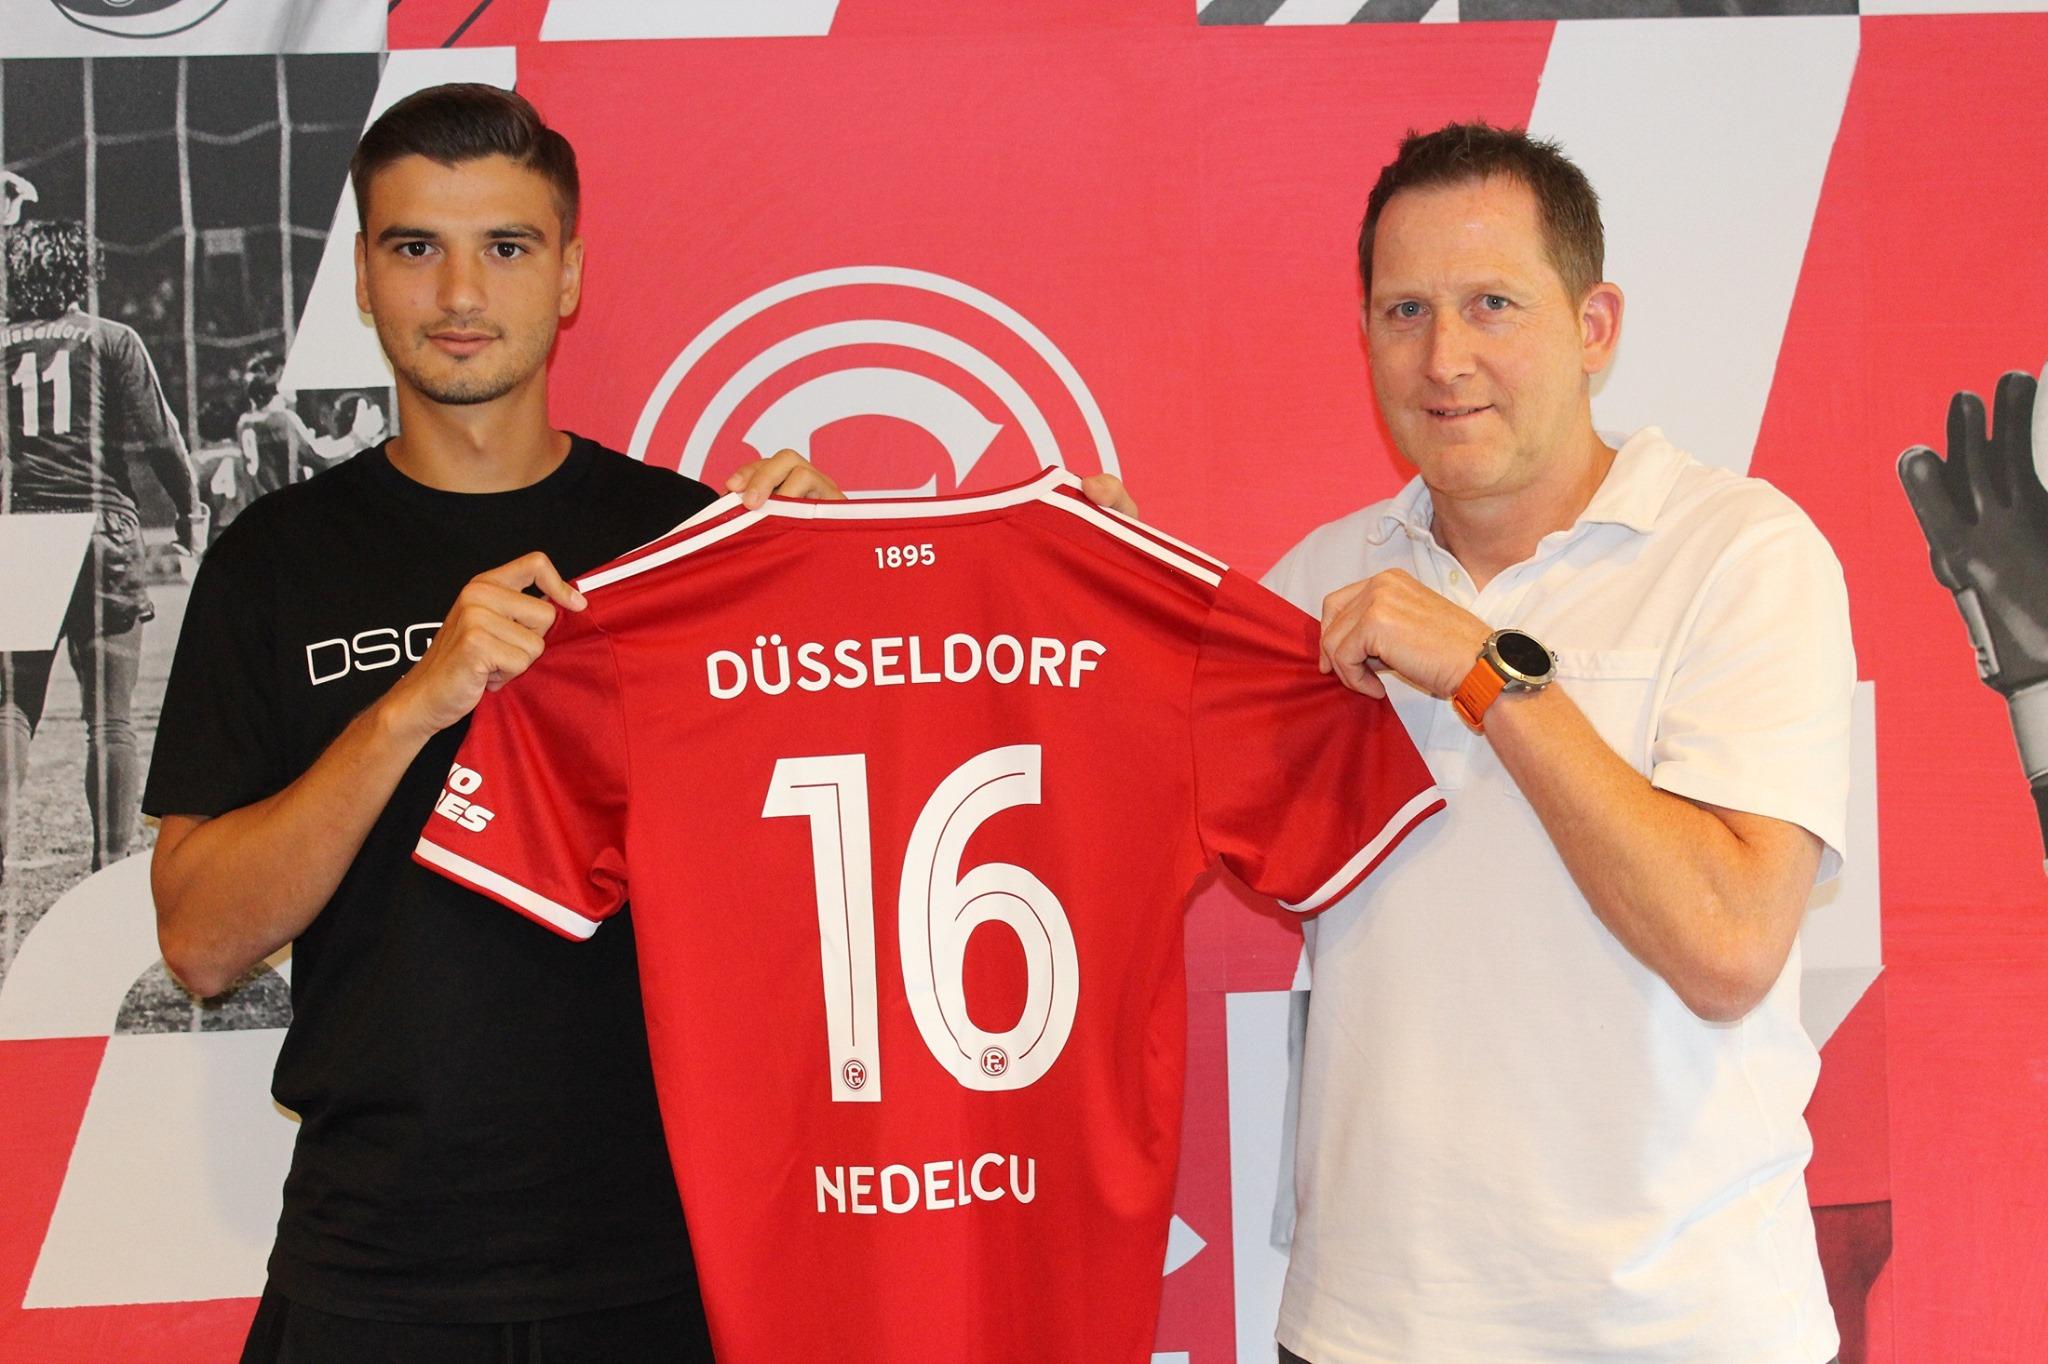 Dragos Nedelcu, prezentat oficial la Fortuna Dusseldorf